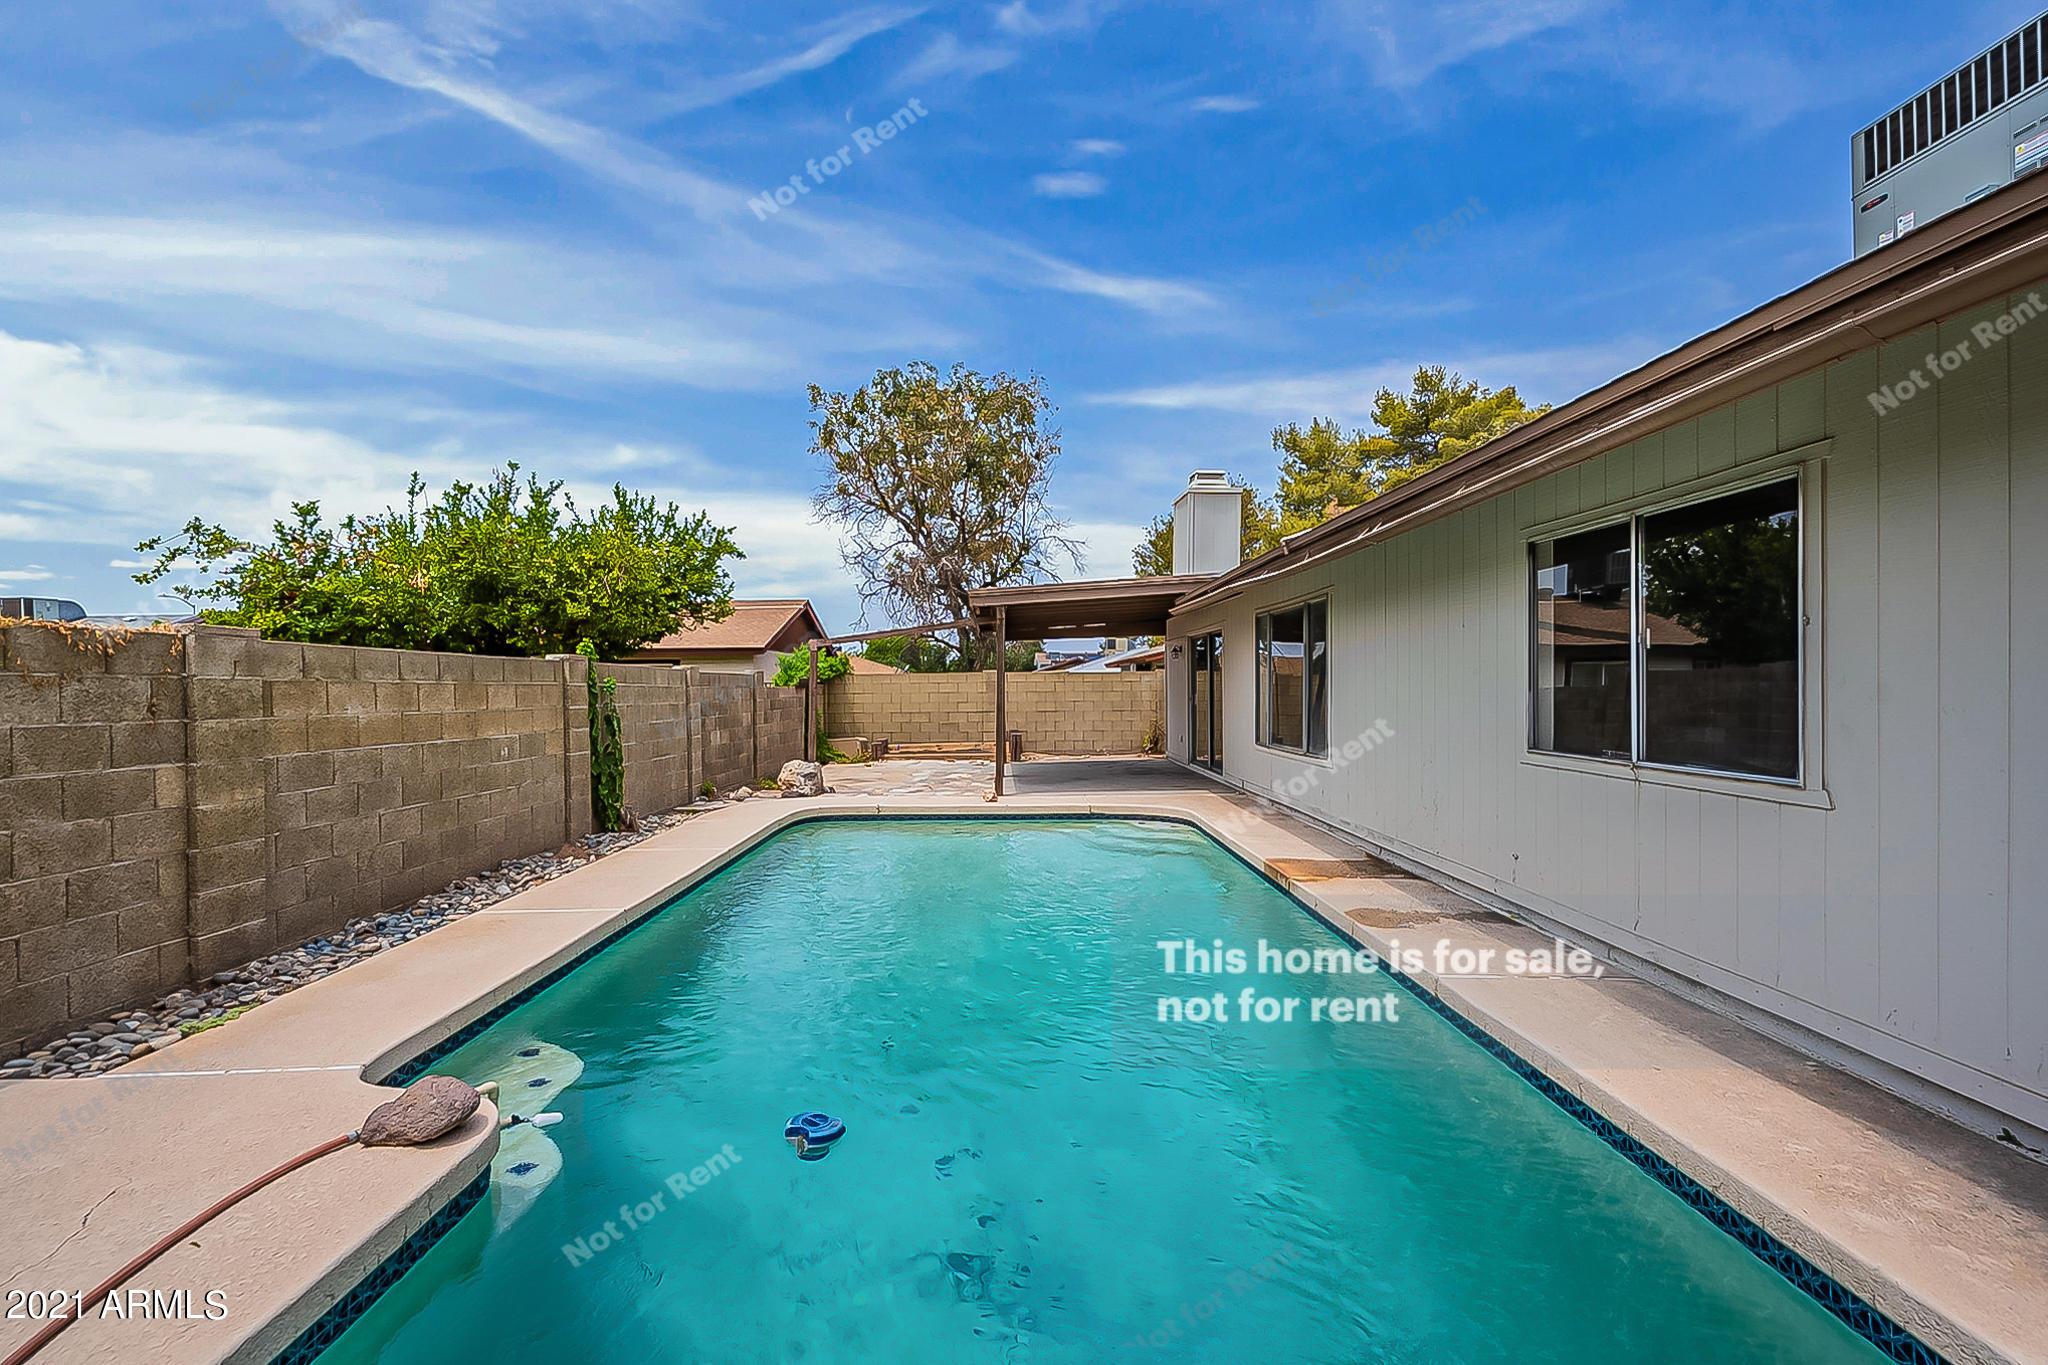 MLS 6270054 5949 W MARY JANE Lane, Glendale, AZ 85306 Glendale AZ Deerview